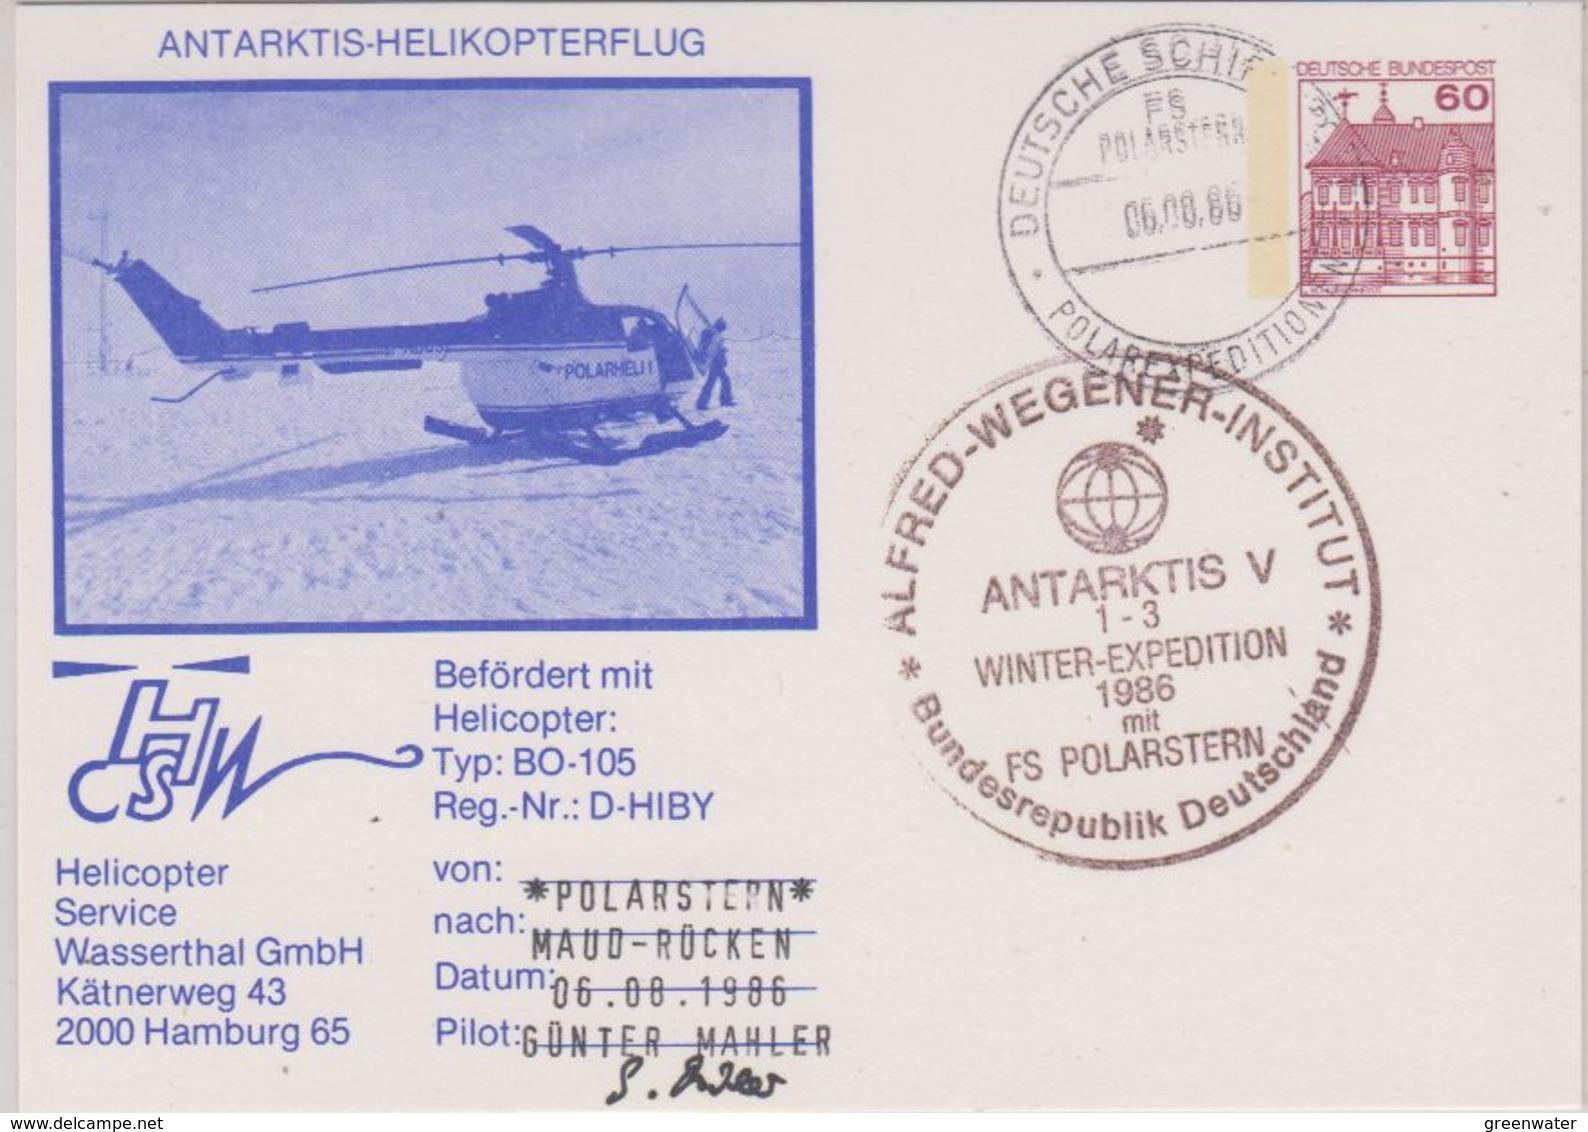 Germany 1986 Heli Flight Polarstern Nach Maud-Rücken Si Pilot Postcard Ca 6.8.86 (42459) - Polar Flights